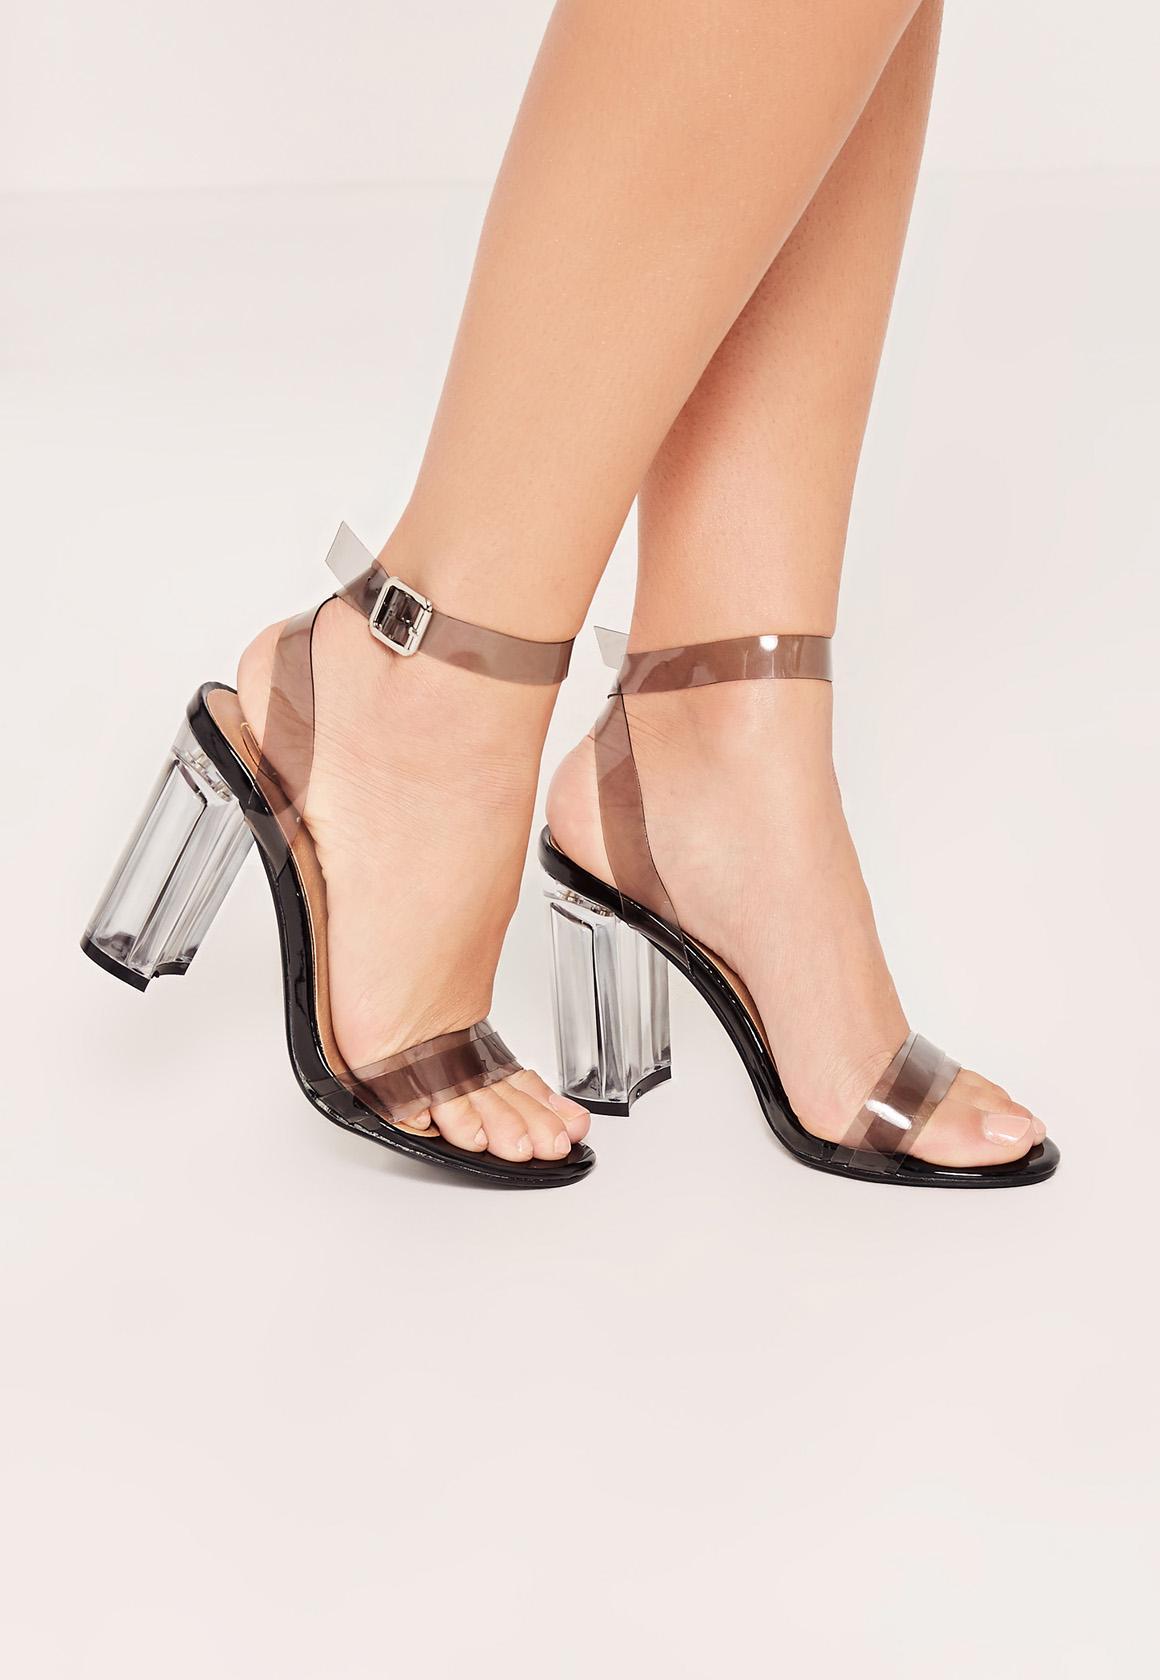 Chaussures Talon En Plastique A L354rjcaq nmNywO8v0